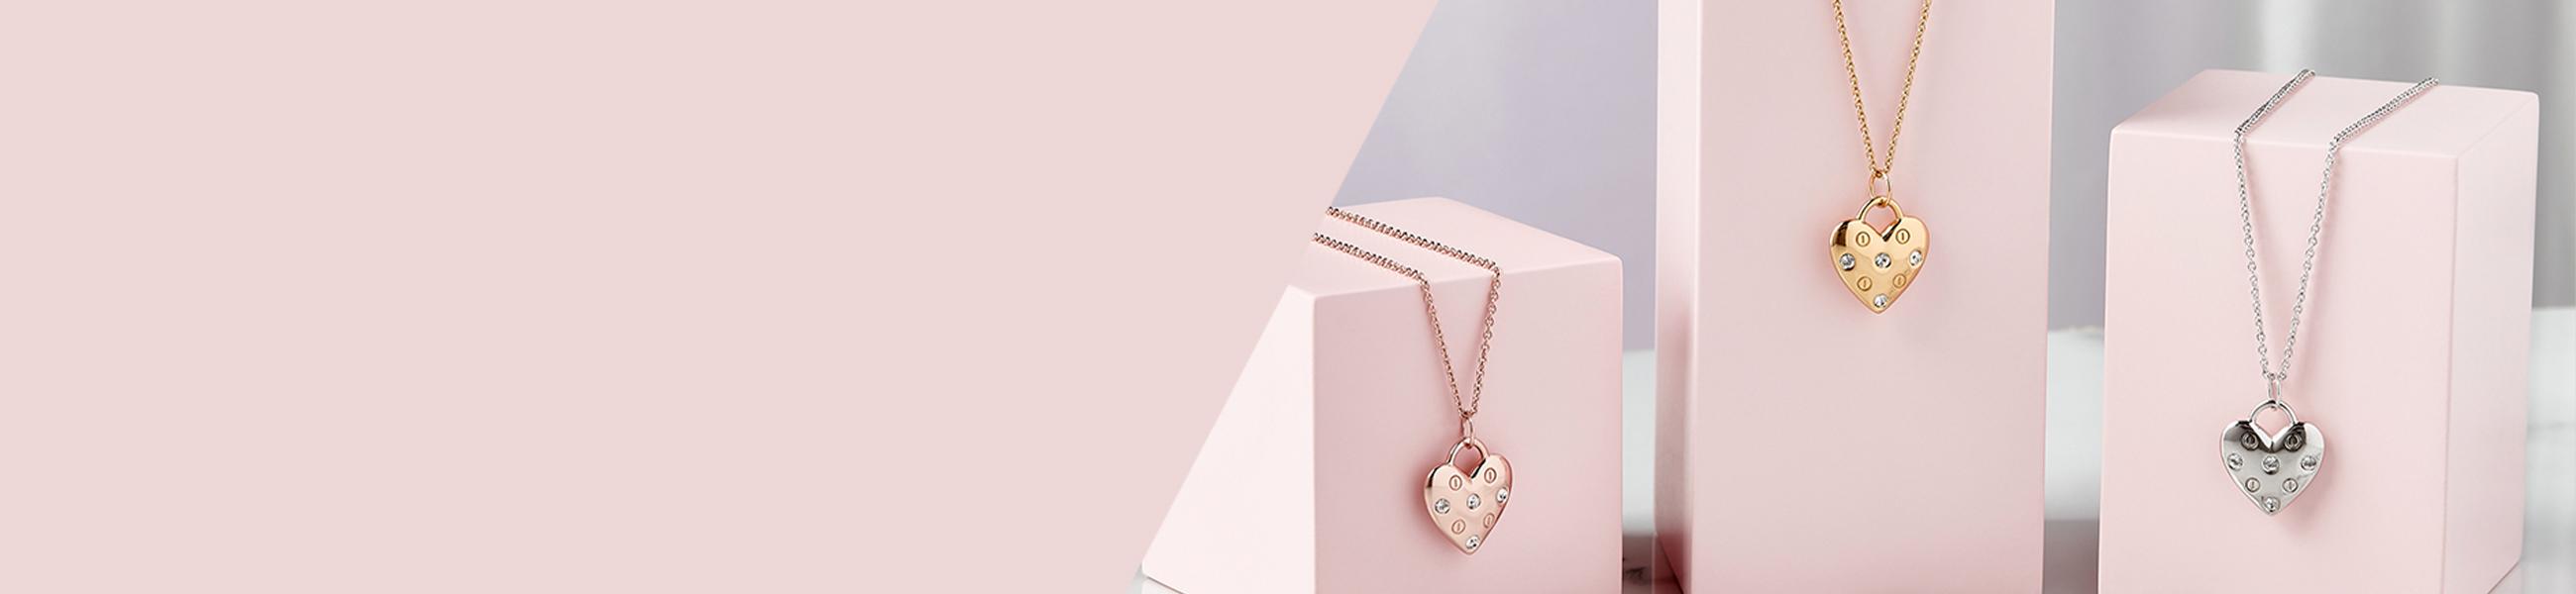 Crystal Embellished Jewelry